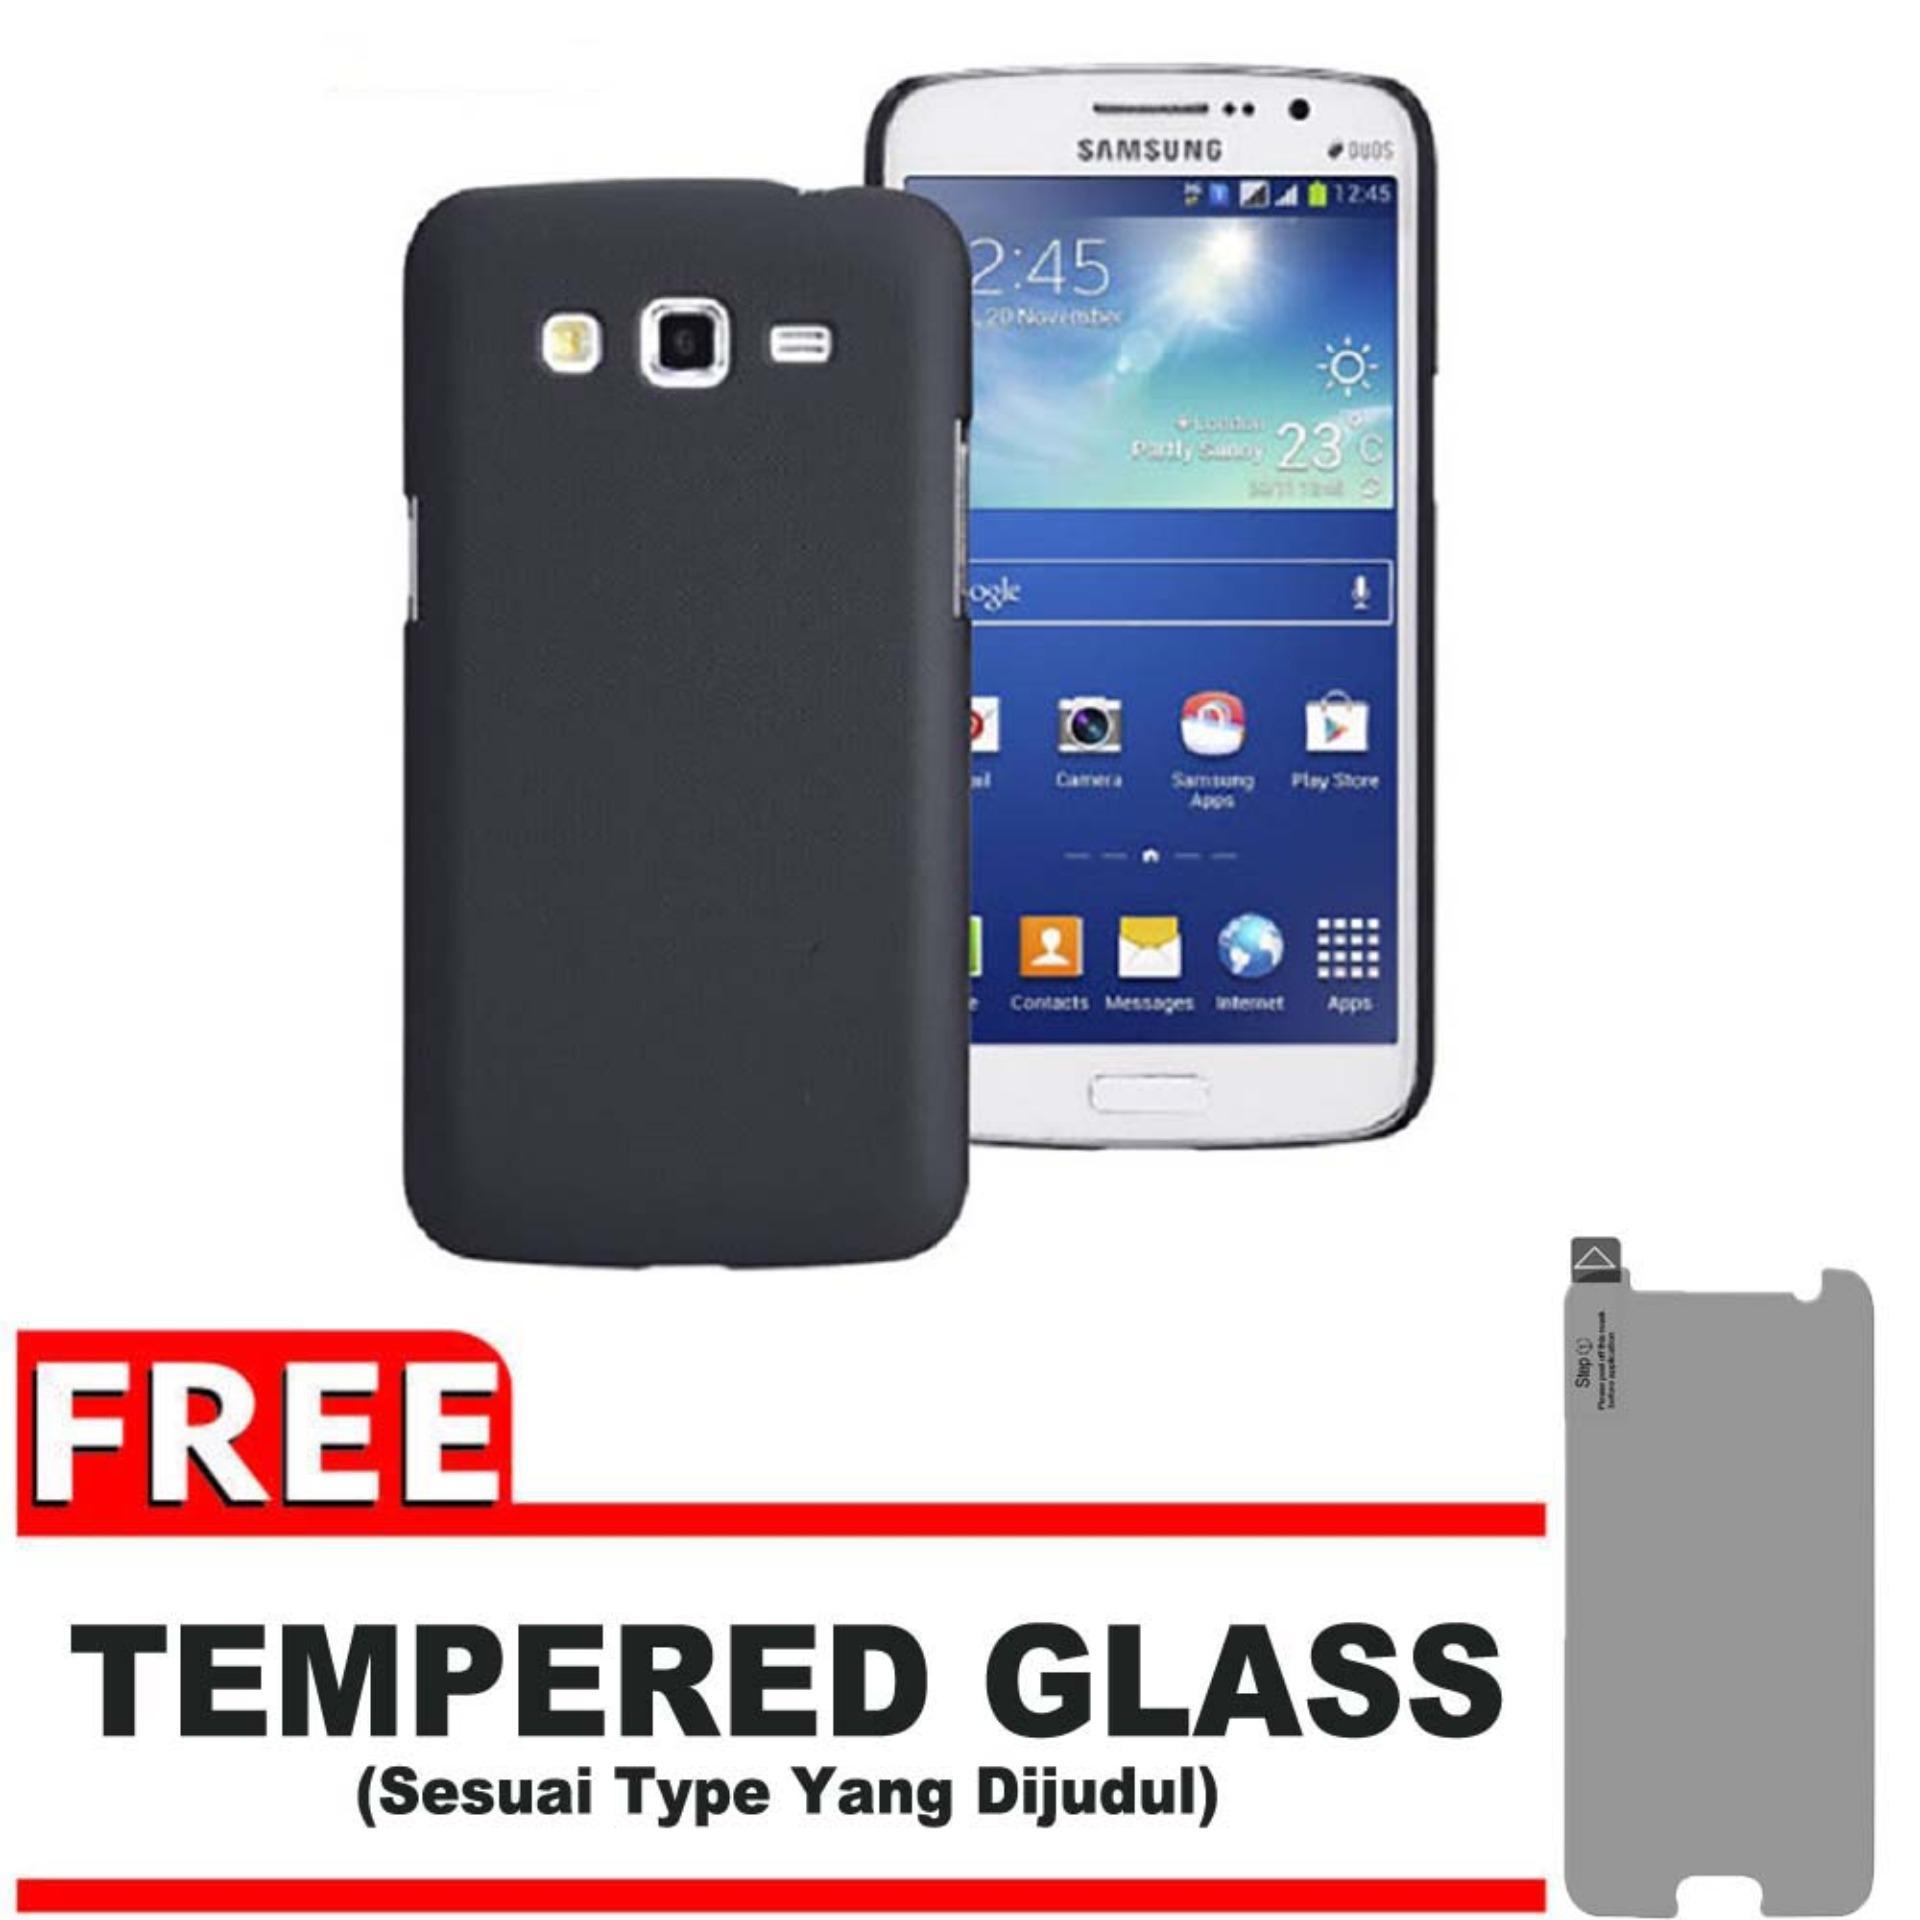 DarkNight for Samsung Galaxy Grand 2 / Duos / G7102 / G7105 | Slim Case Black Matte Softcase Premium (Anti Minyak/Anti Sidik Jari) + Gratis Free Tempered Glass Protector - Hitam Doff